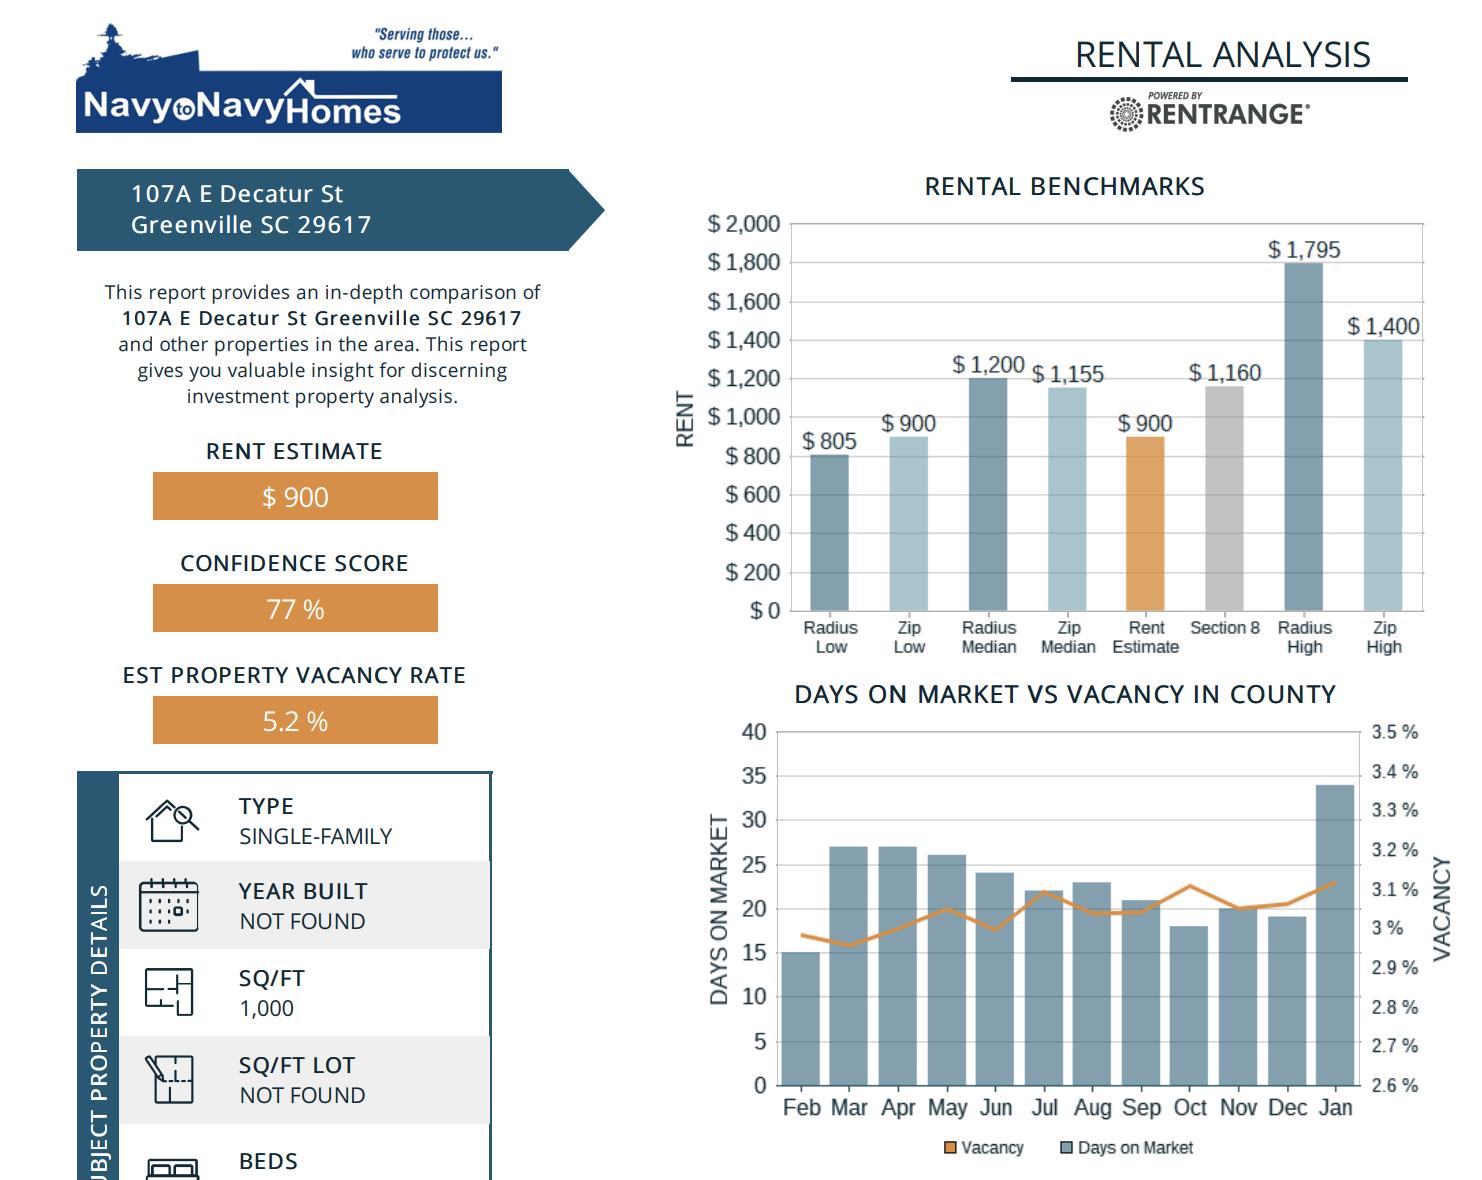 Jacksonville, FL Rental Property Assessment